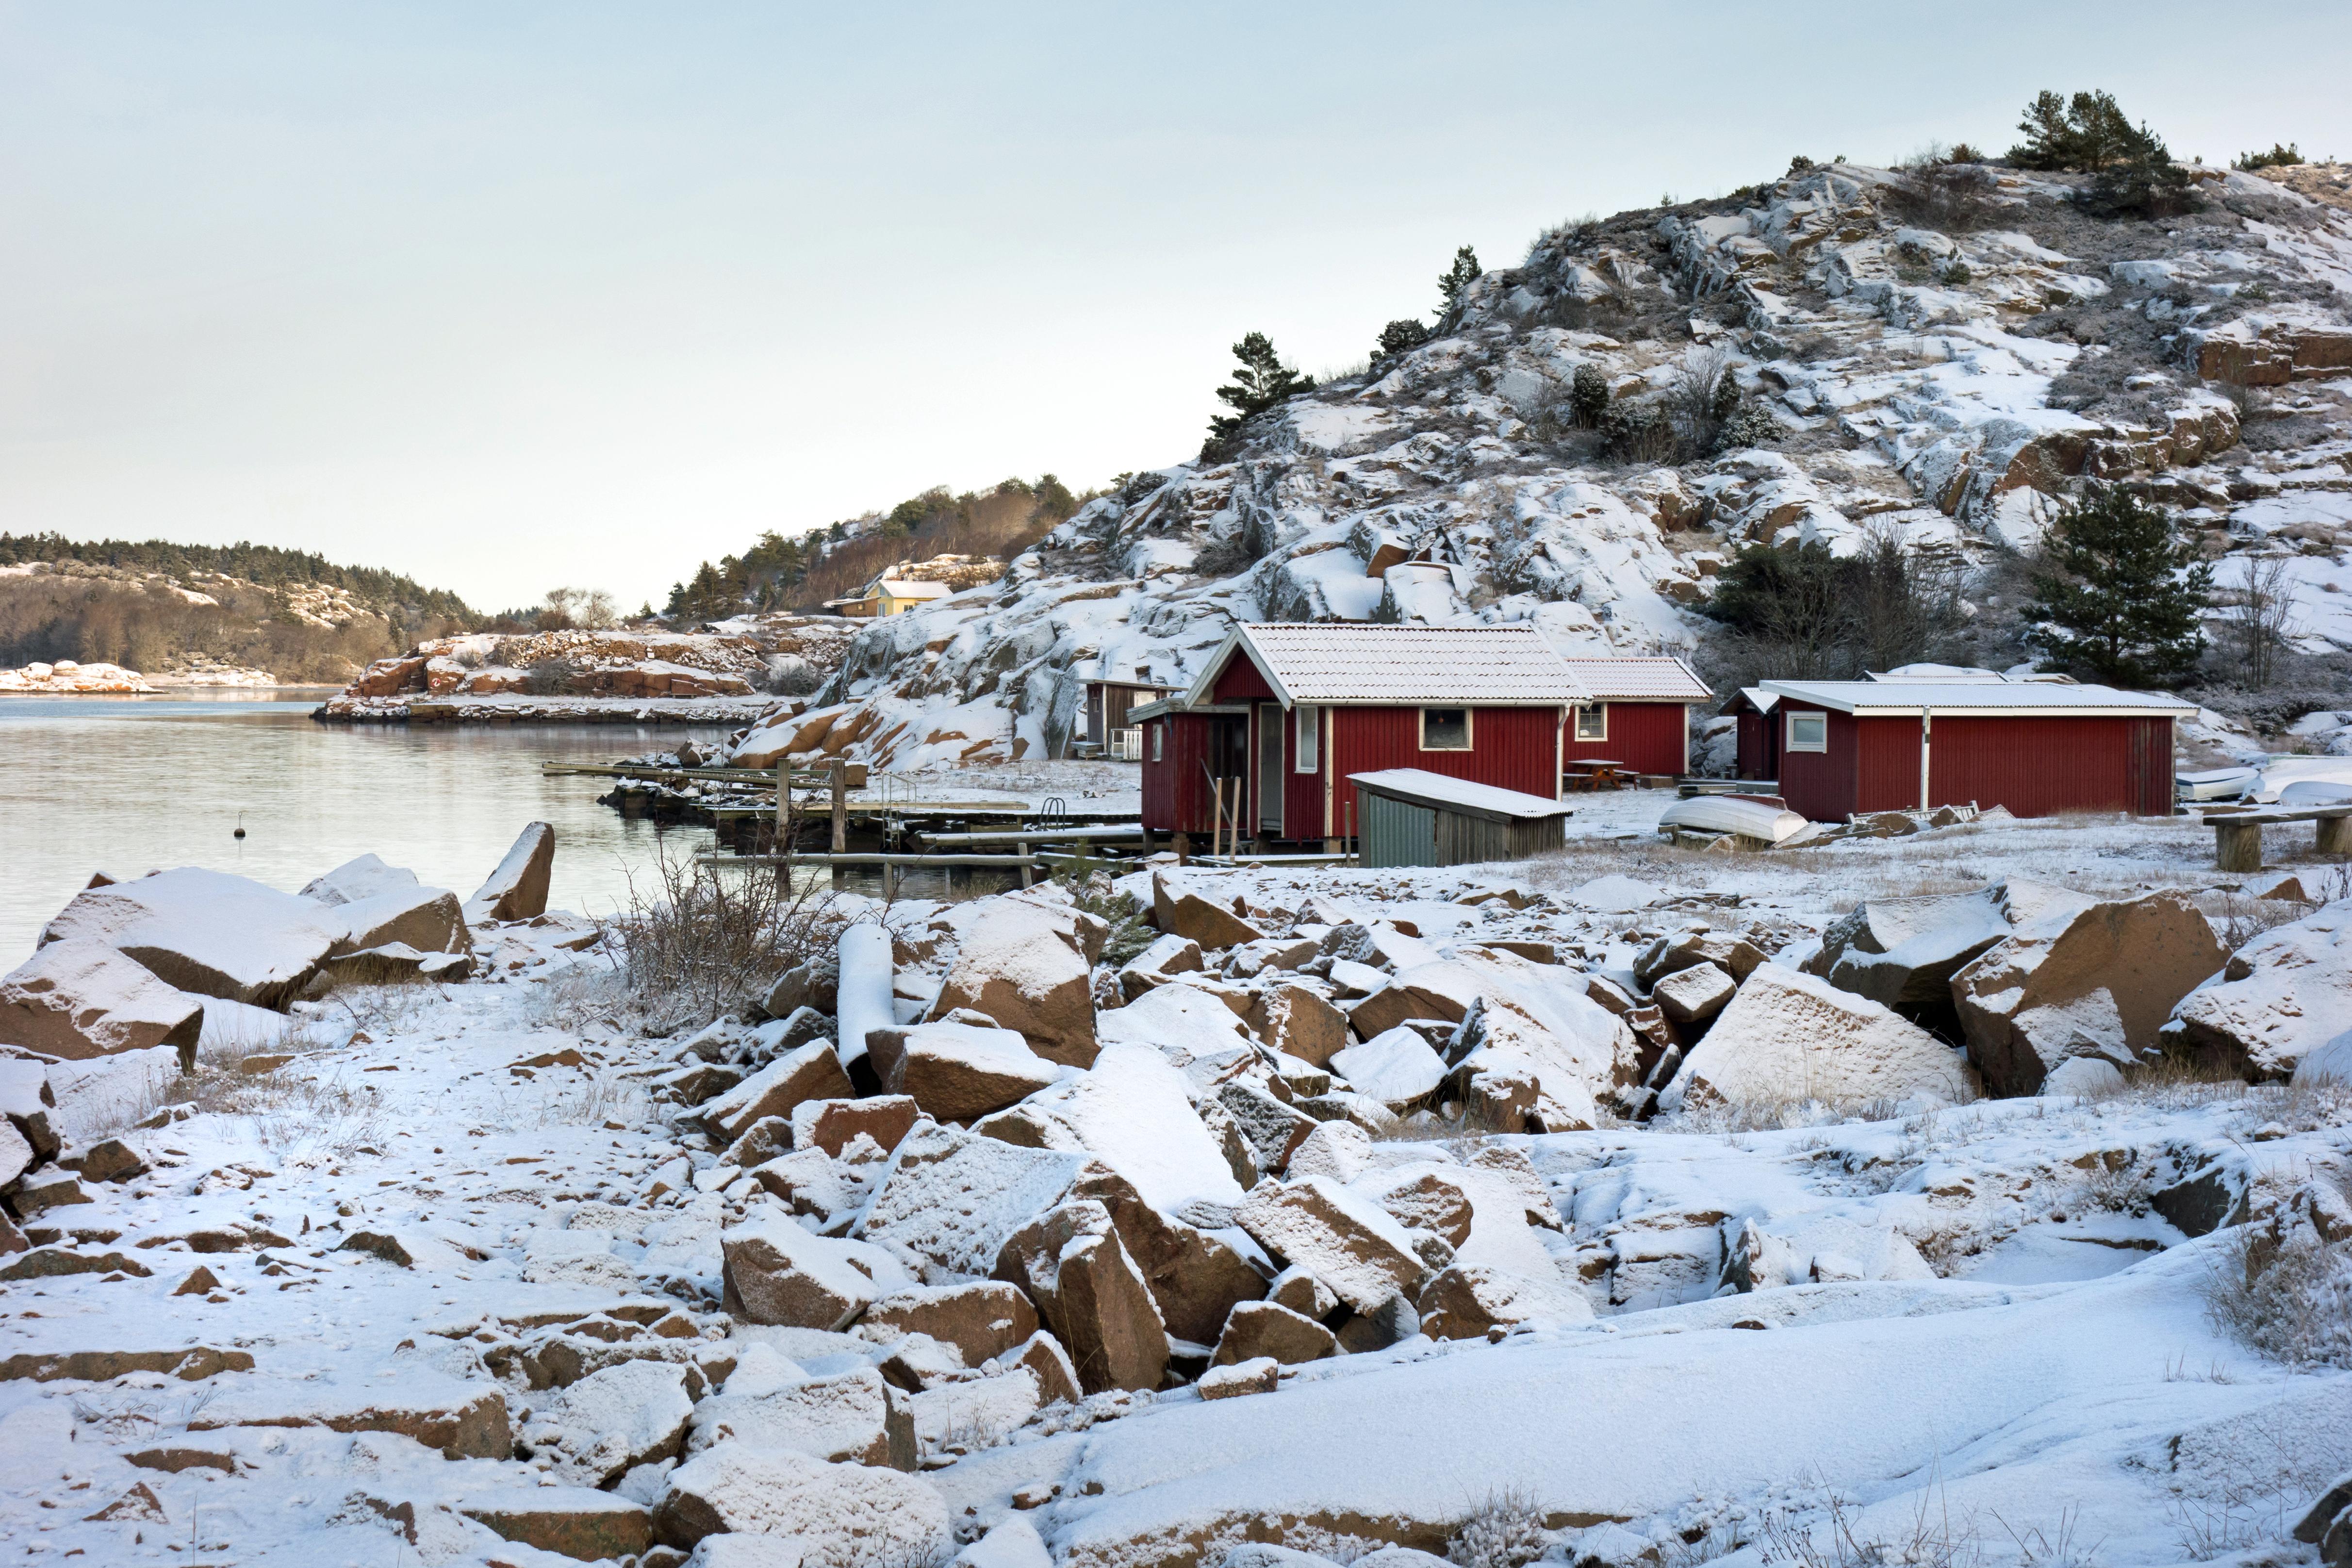 Loddebo fishing huts in winter photo